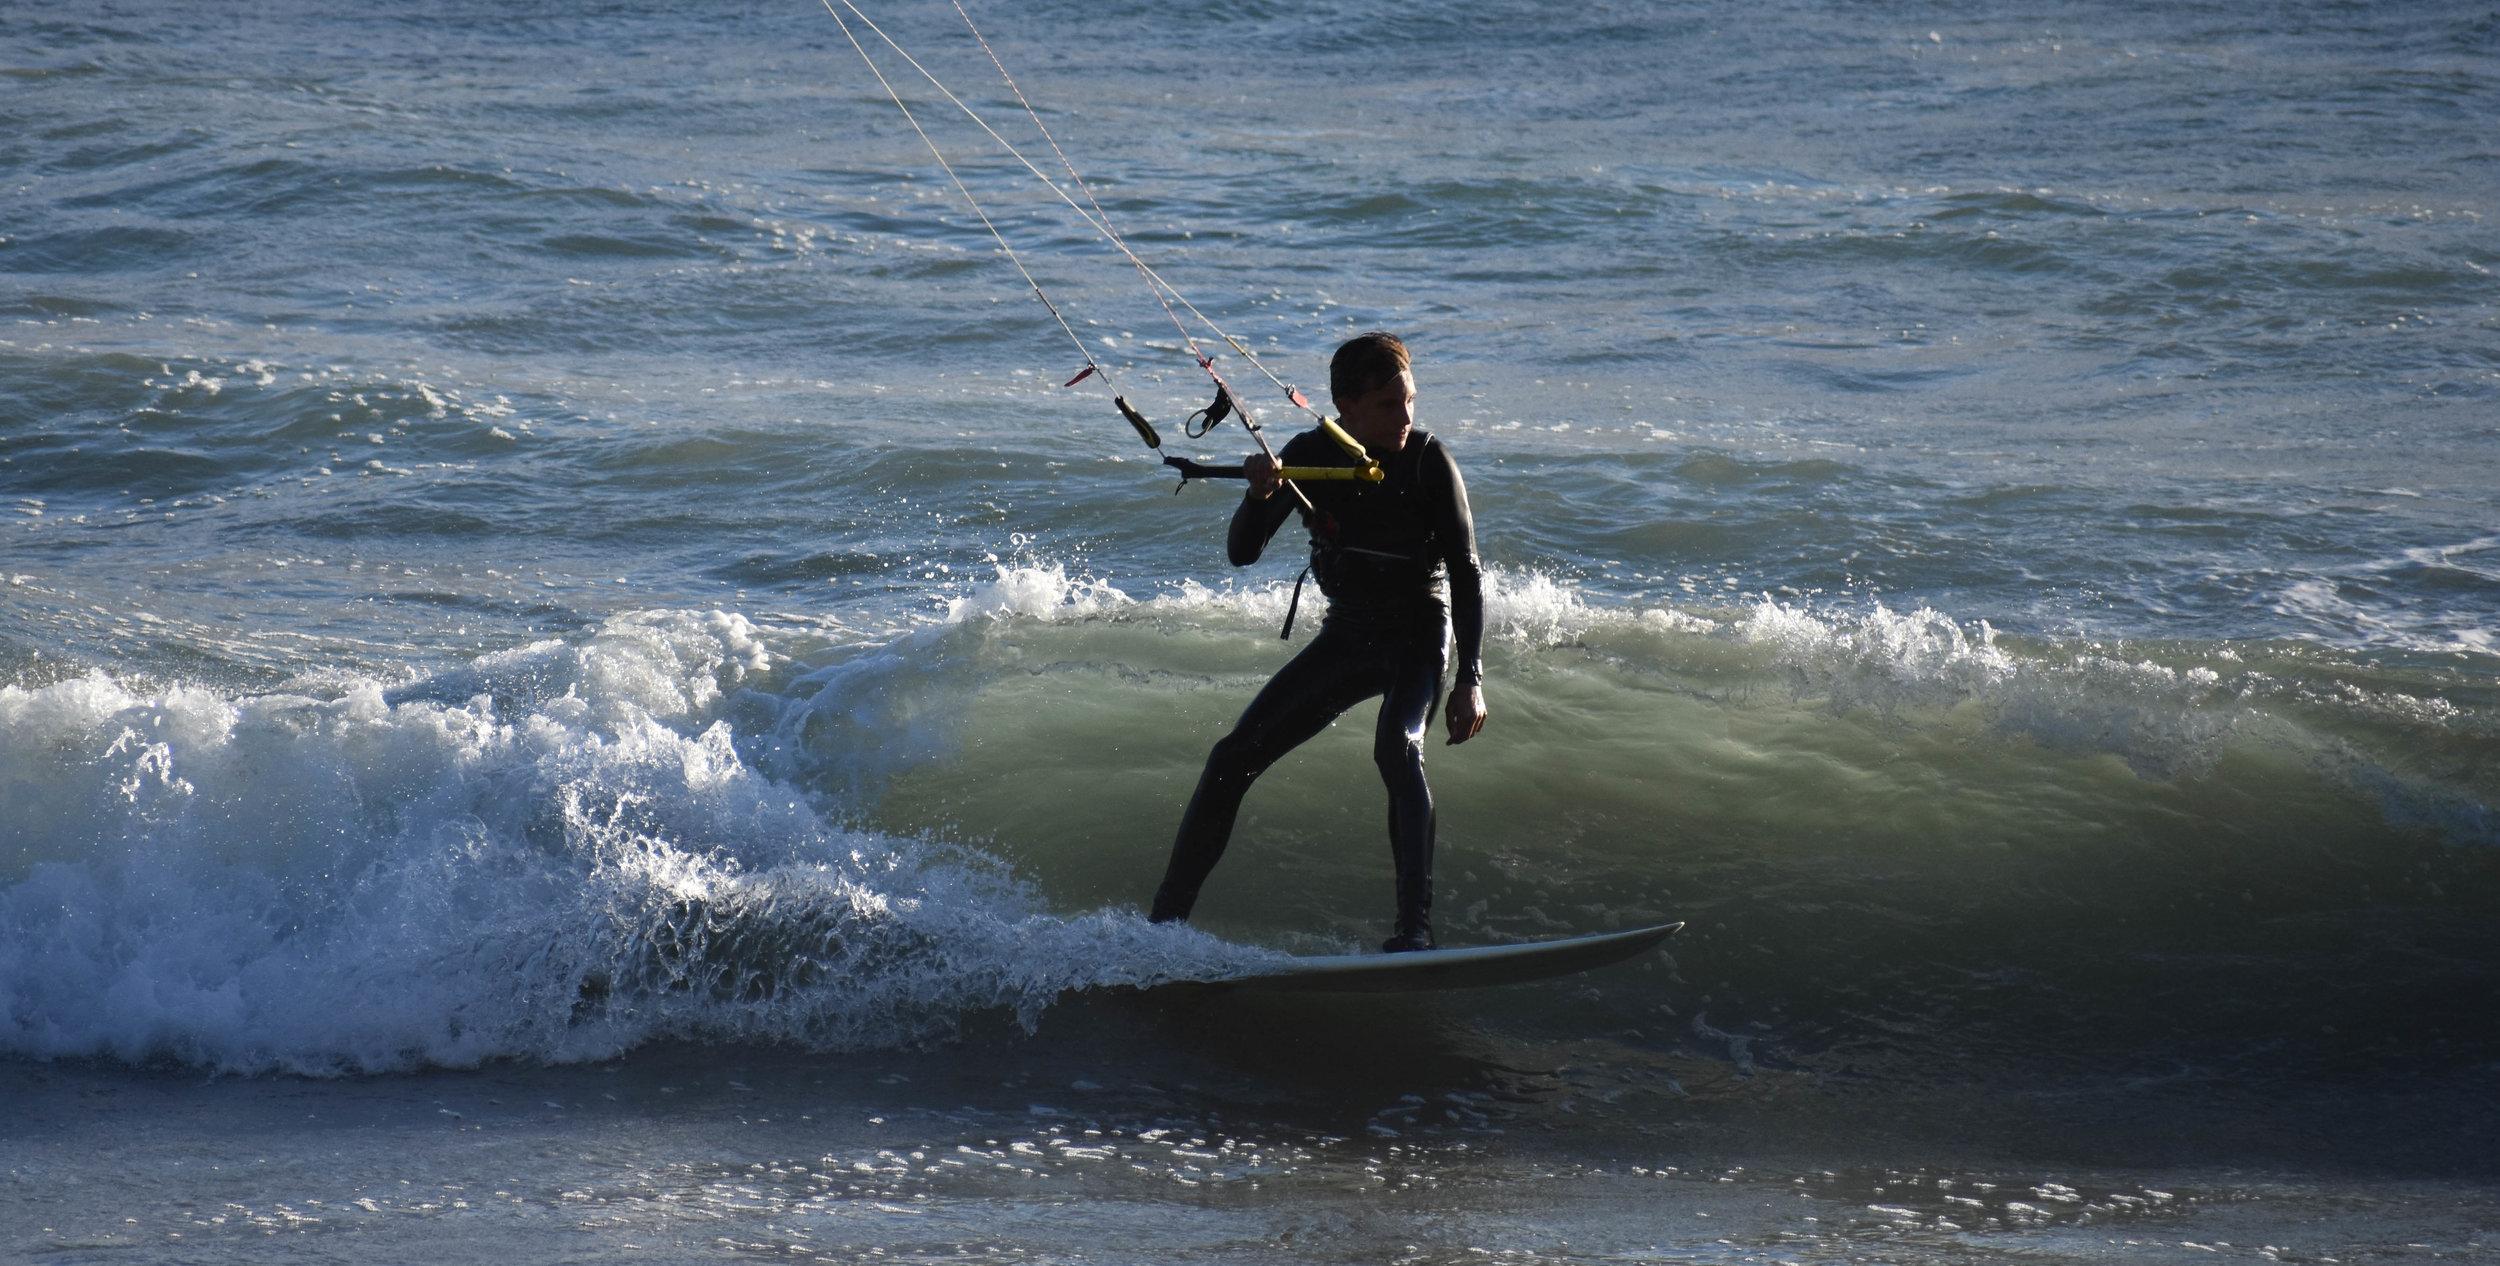 Kitesurfing at Waddell Creek Beach in Santa Cruz, CA